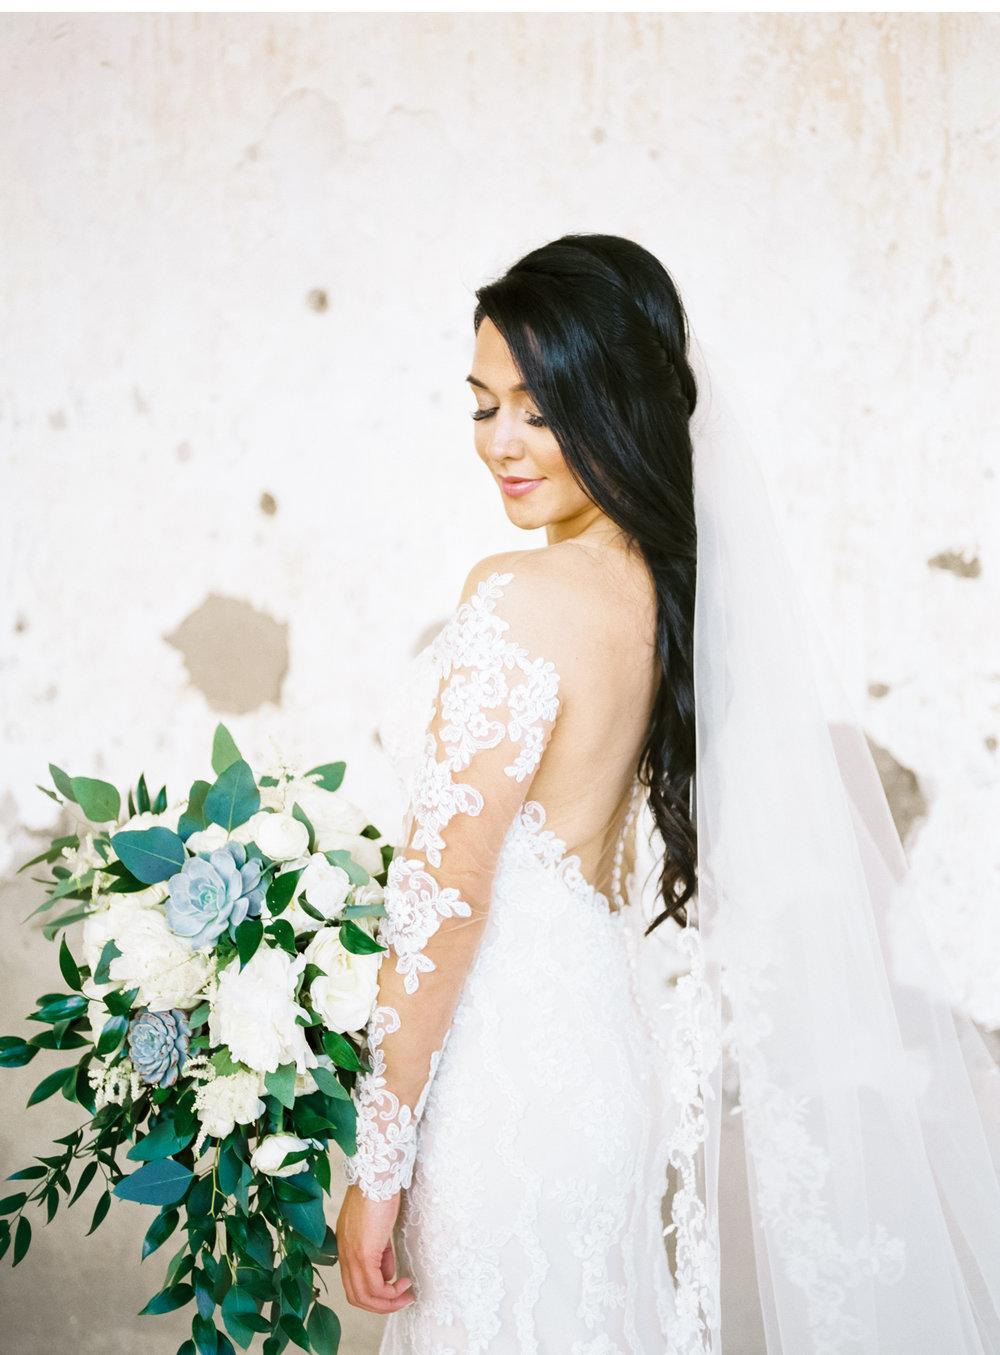 San-Diego-Weddings-Natalie-Schutt-Photography_13.jpg